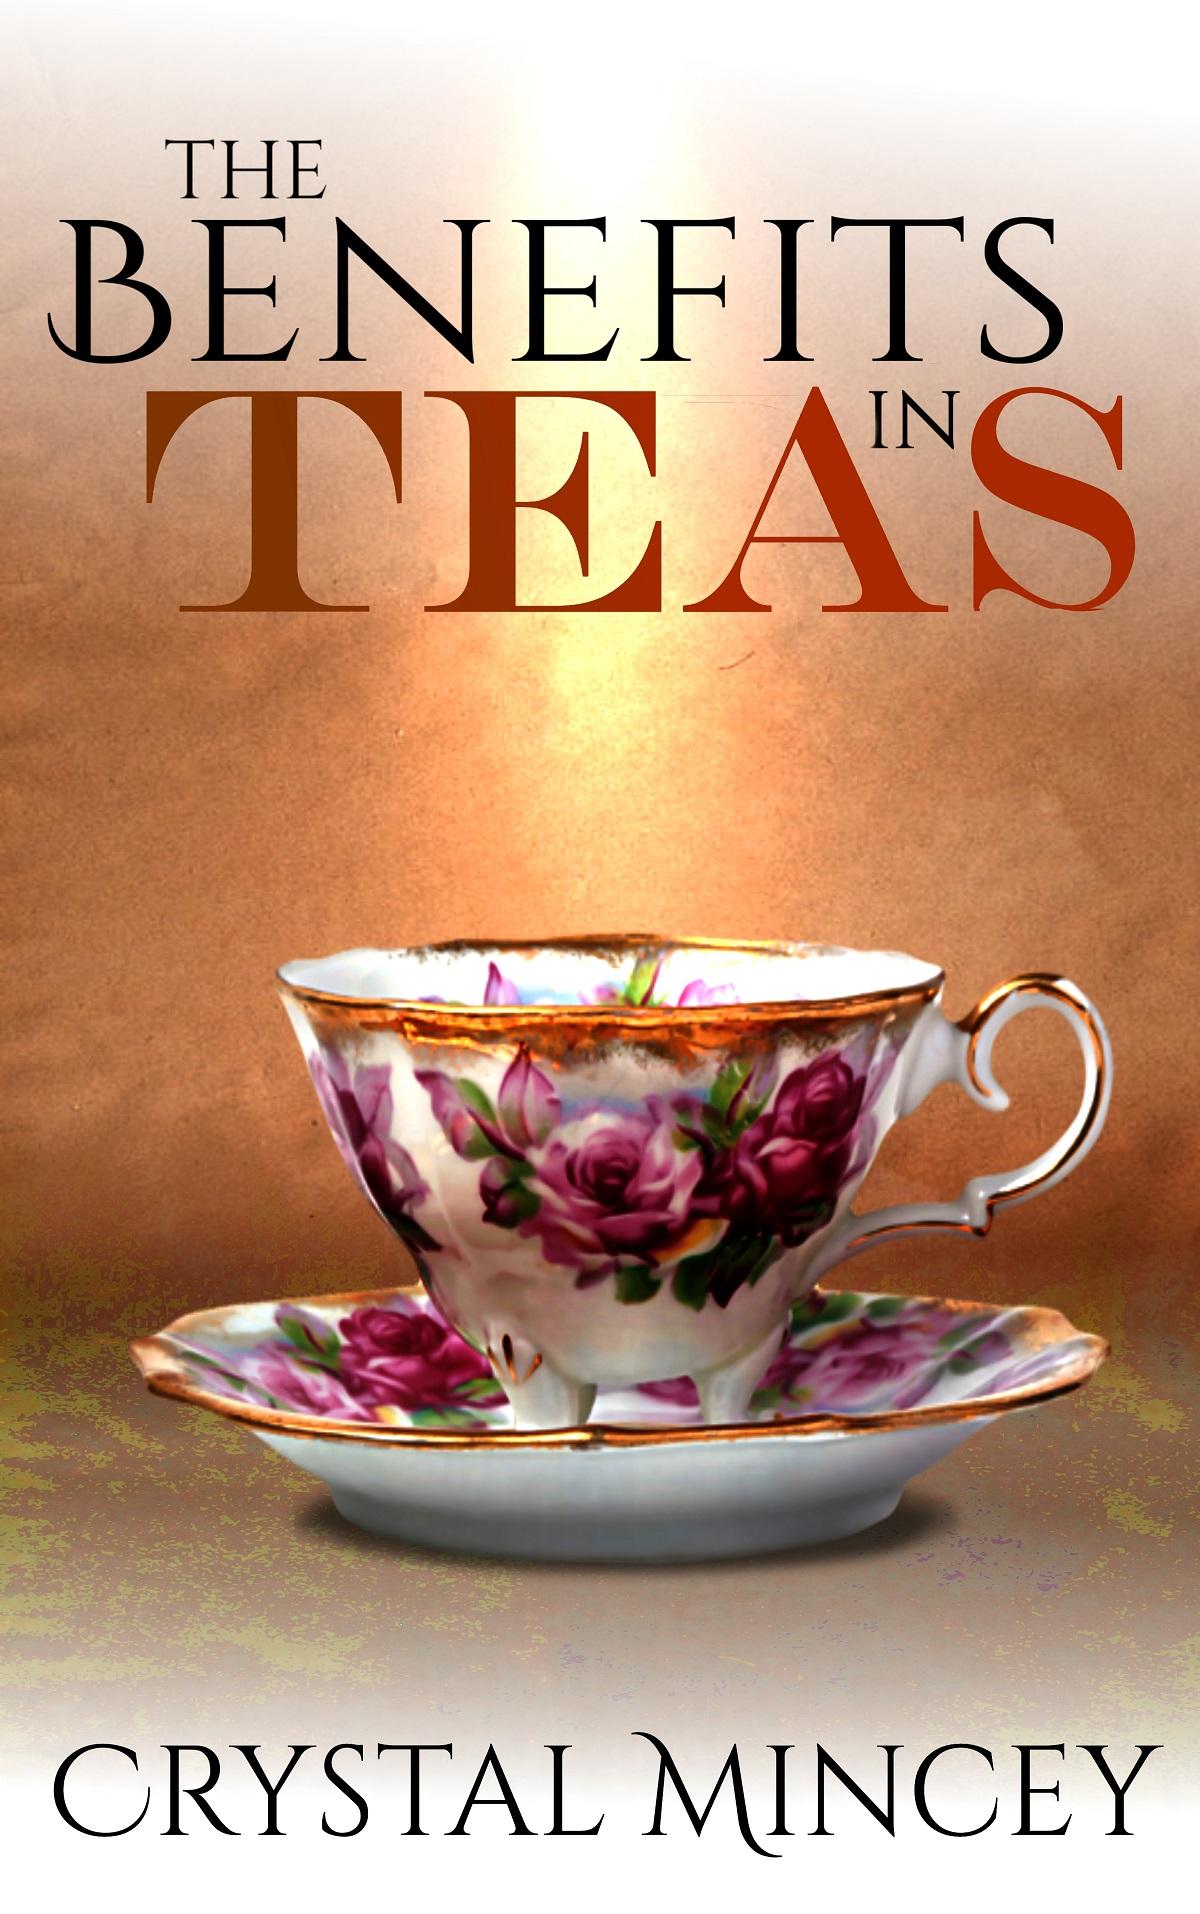 TeaBenefits